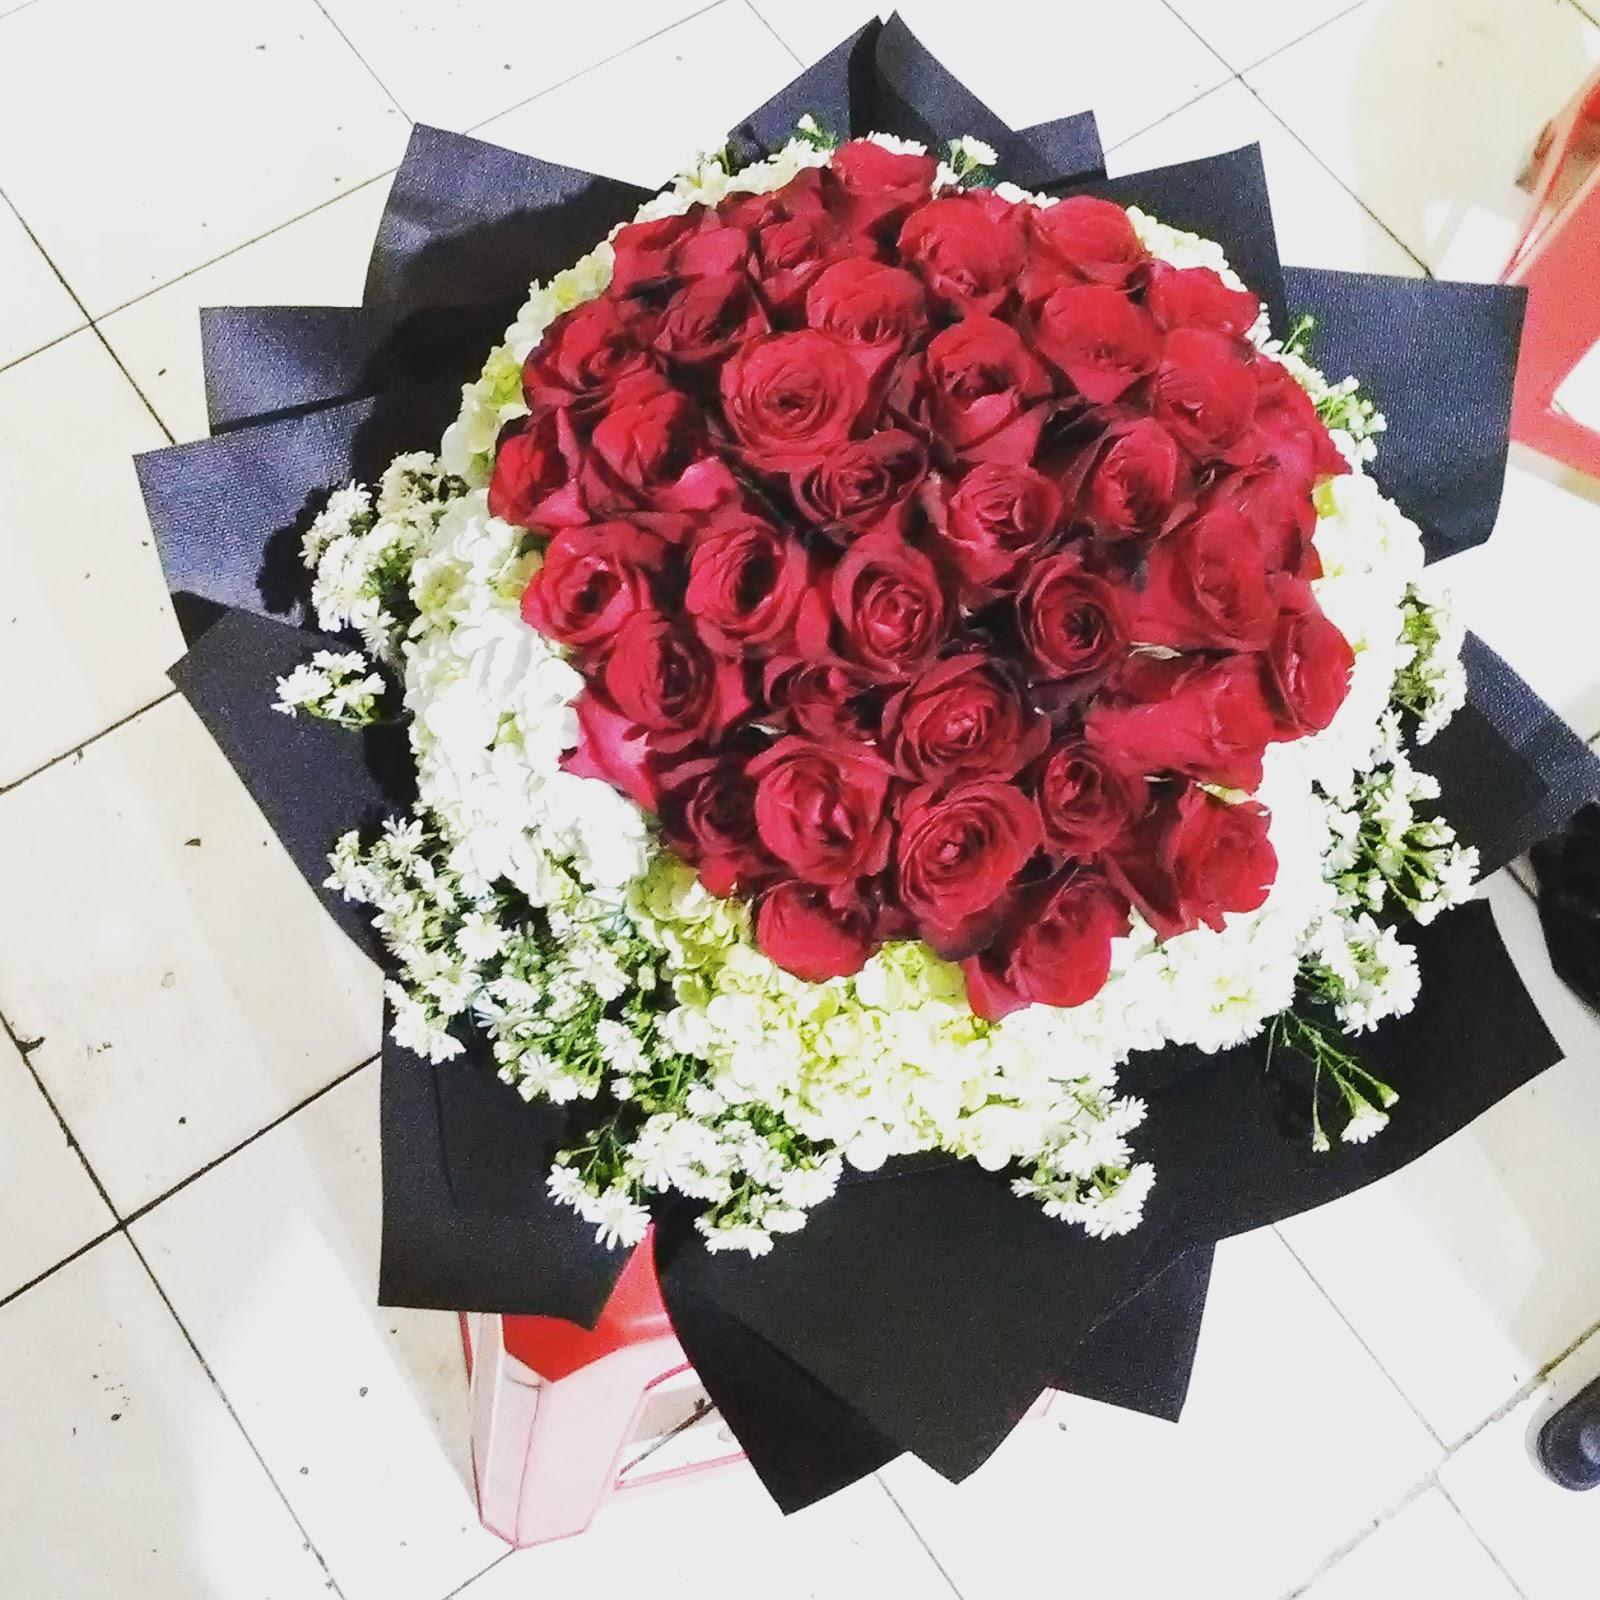 Karangan Bunga Mawar Merah Asli Cantik Untuk Pacar